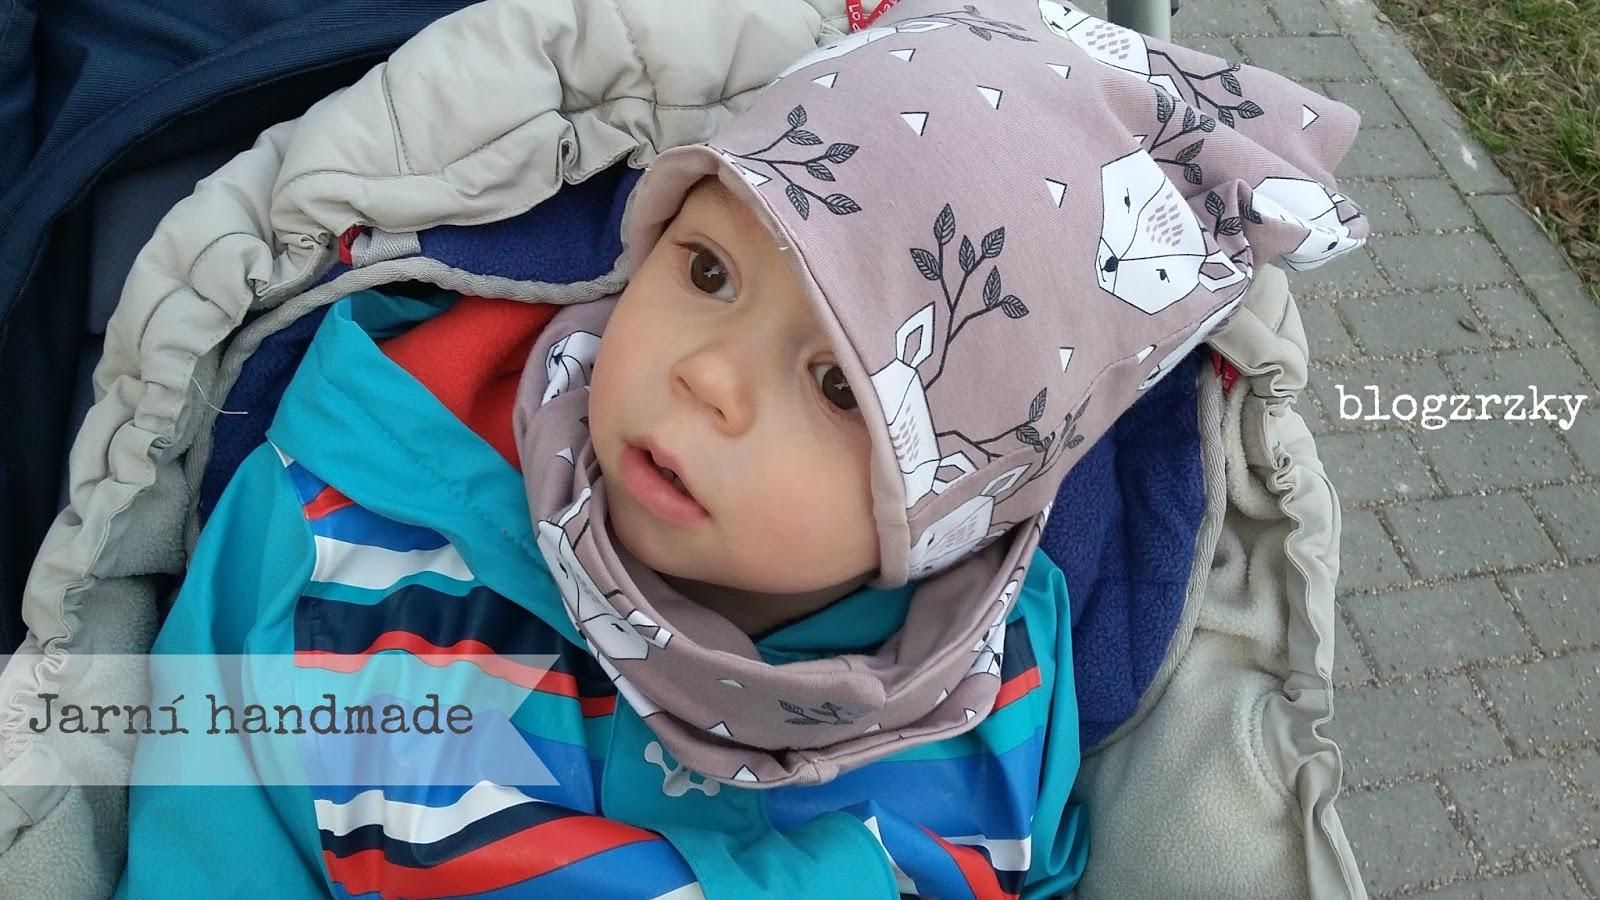 22a7b1eaae14 Blog Zrzky  Jaro stylově   Giveaway o beanie od BeBirdie